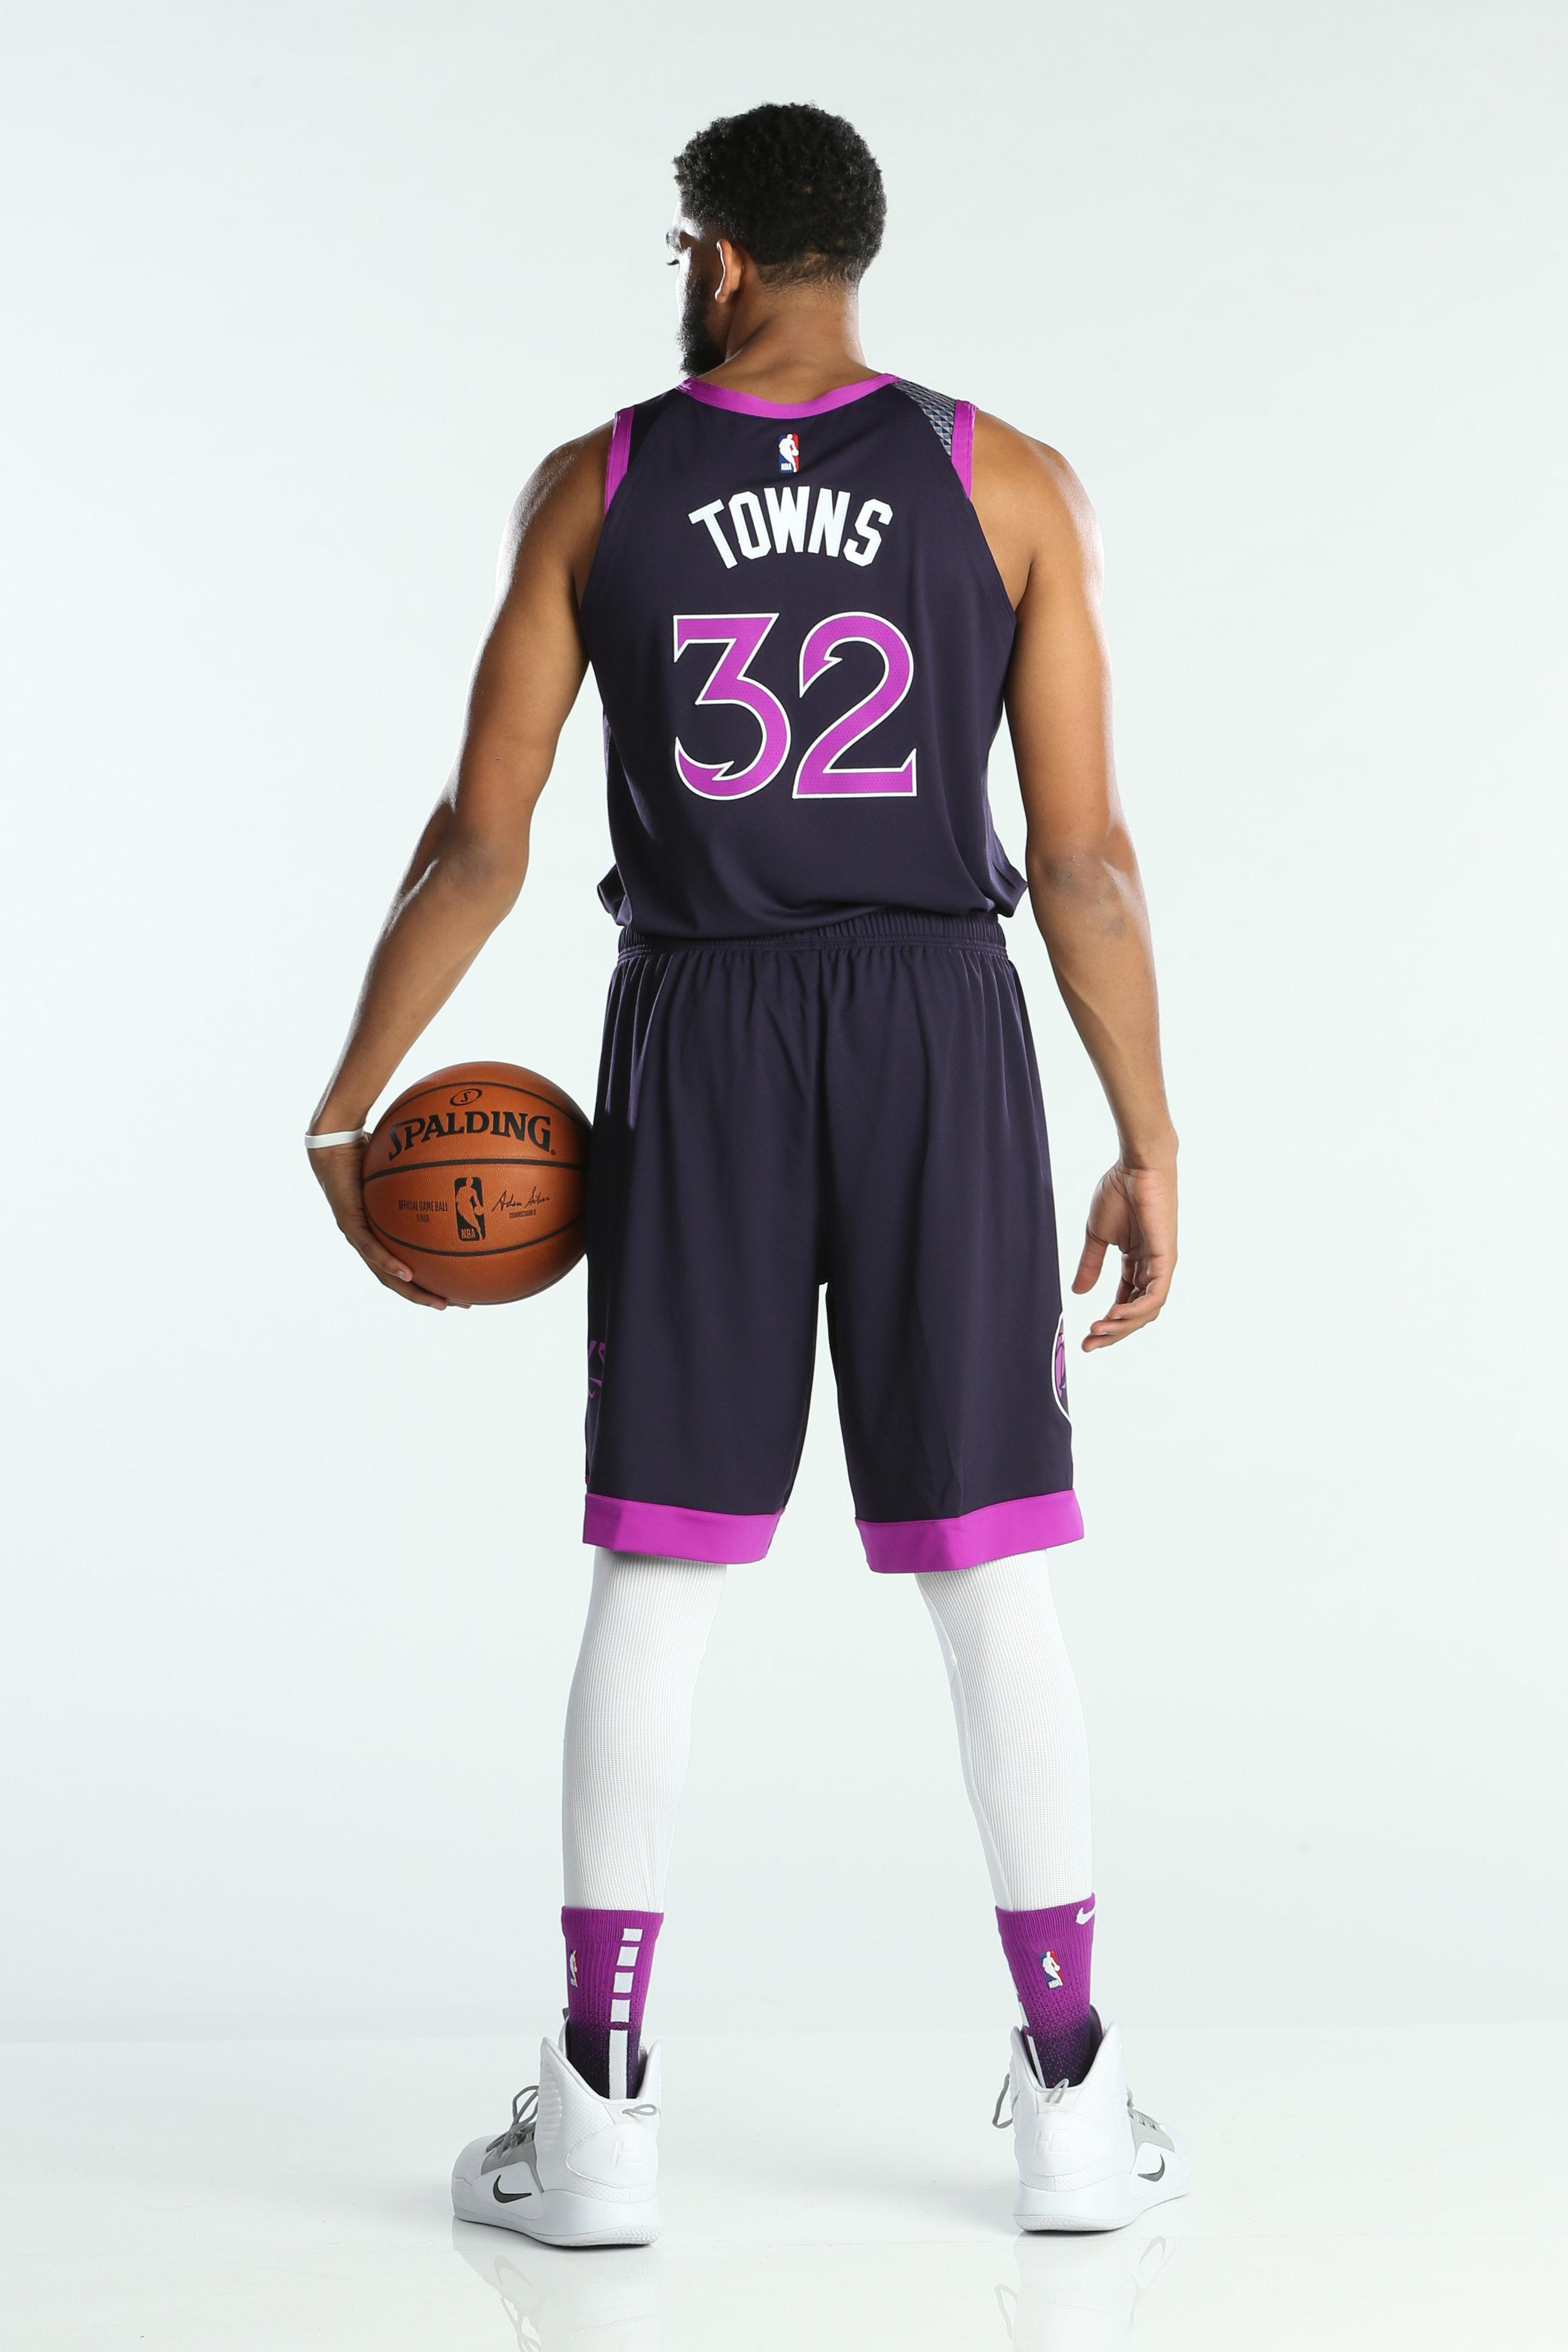 Timberwolves City Edition Uniforms Uniswag